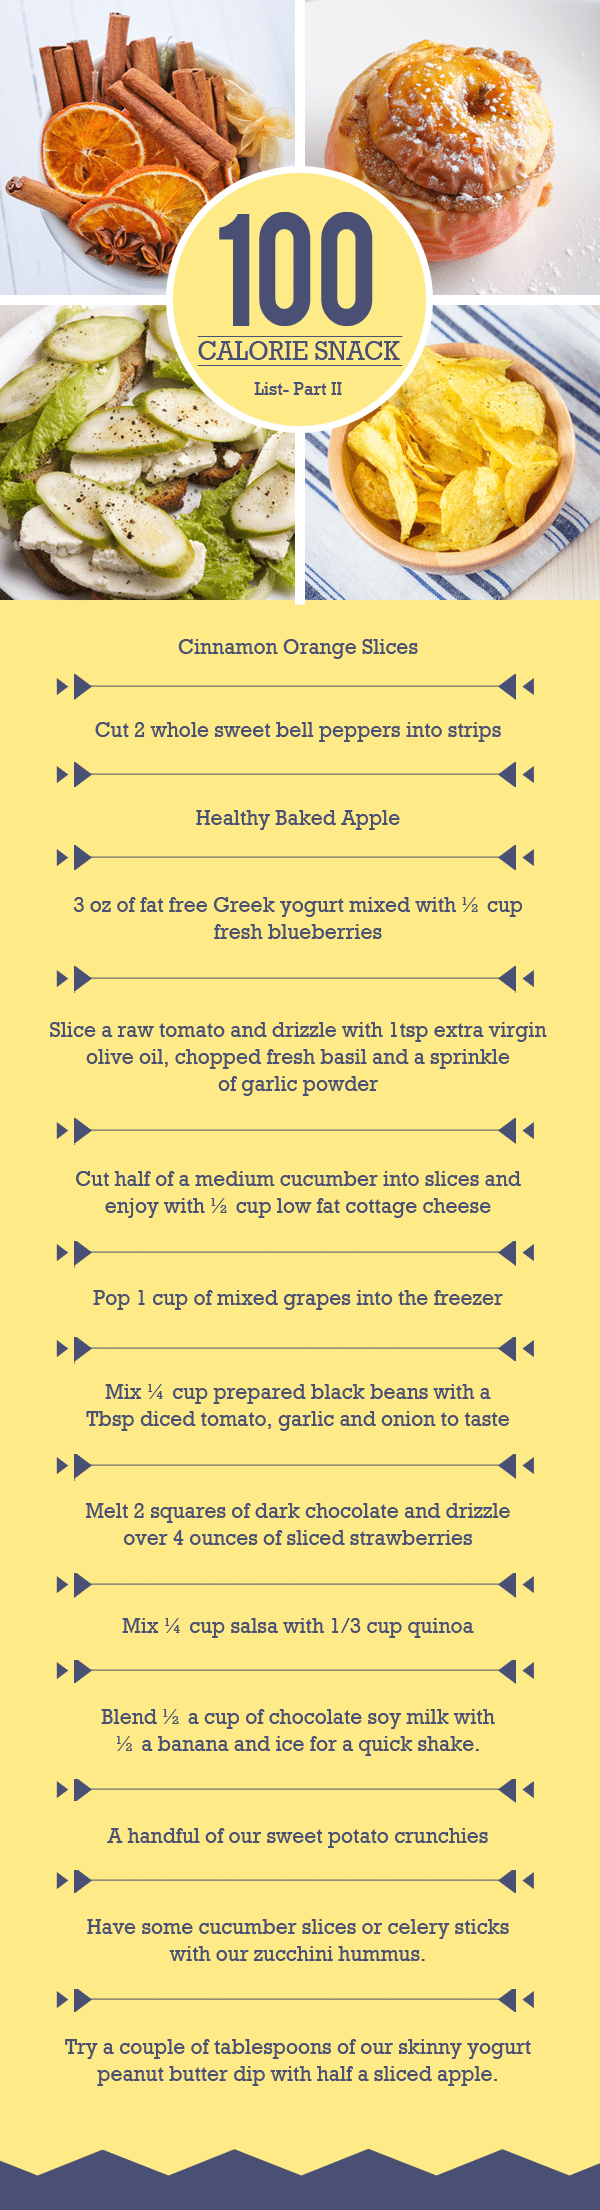 Easy to Prepare 100 Calorie Snacks